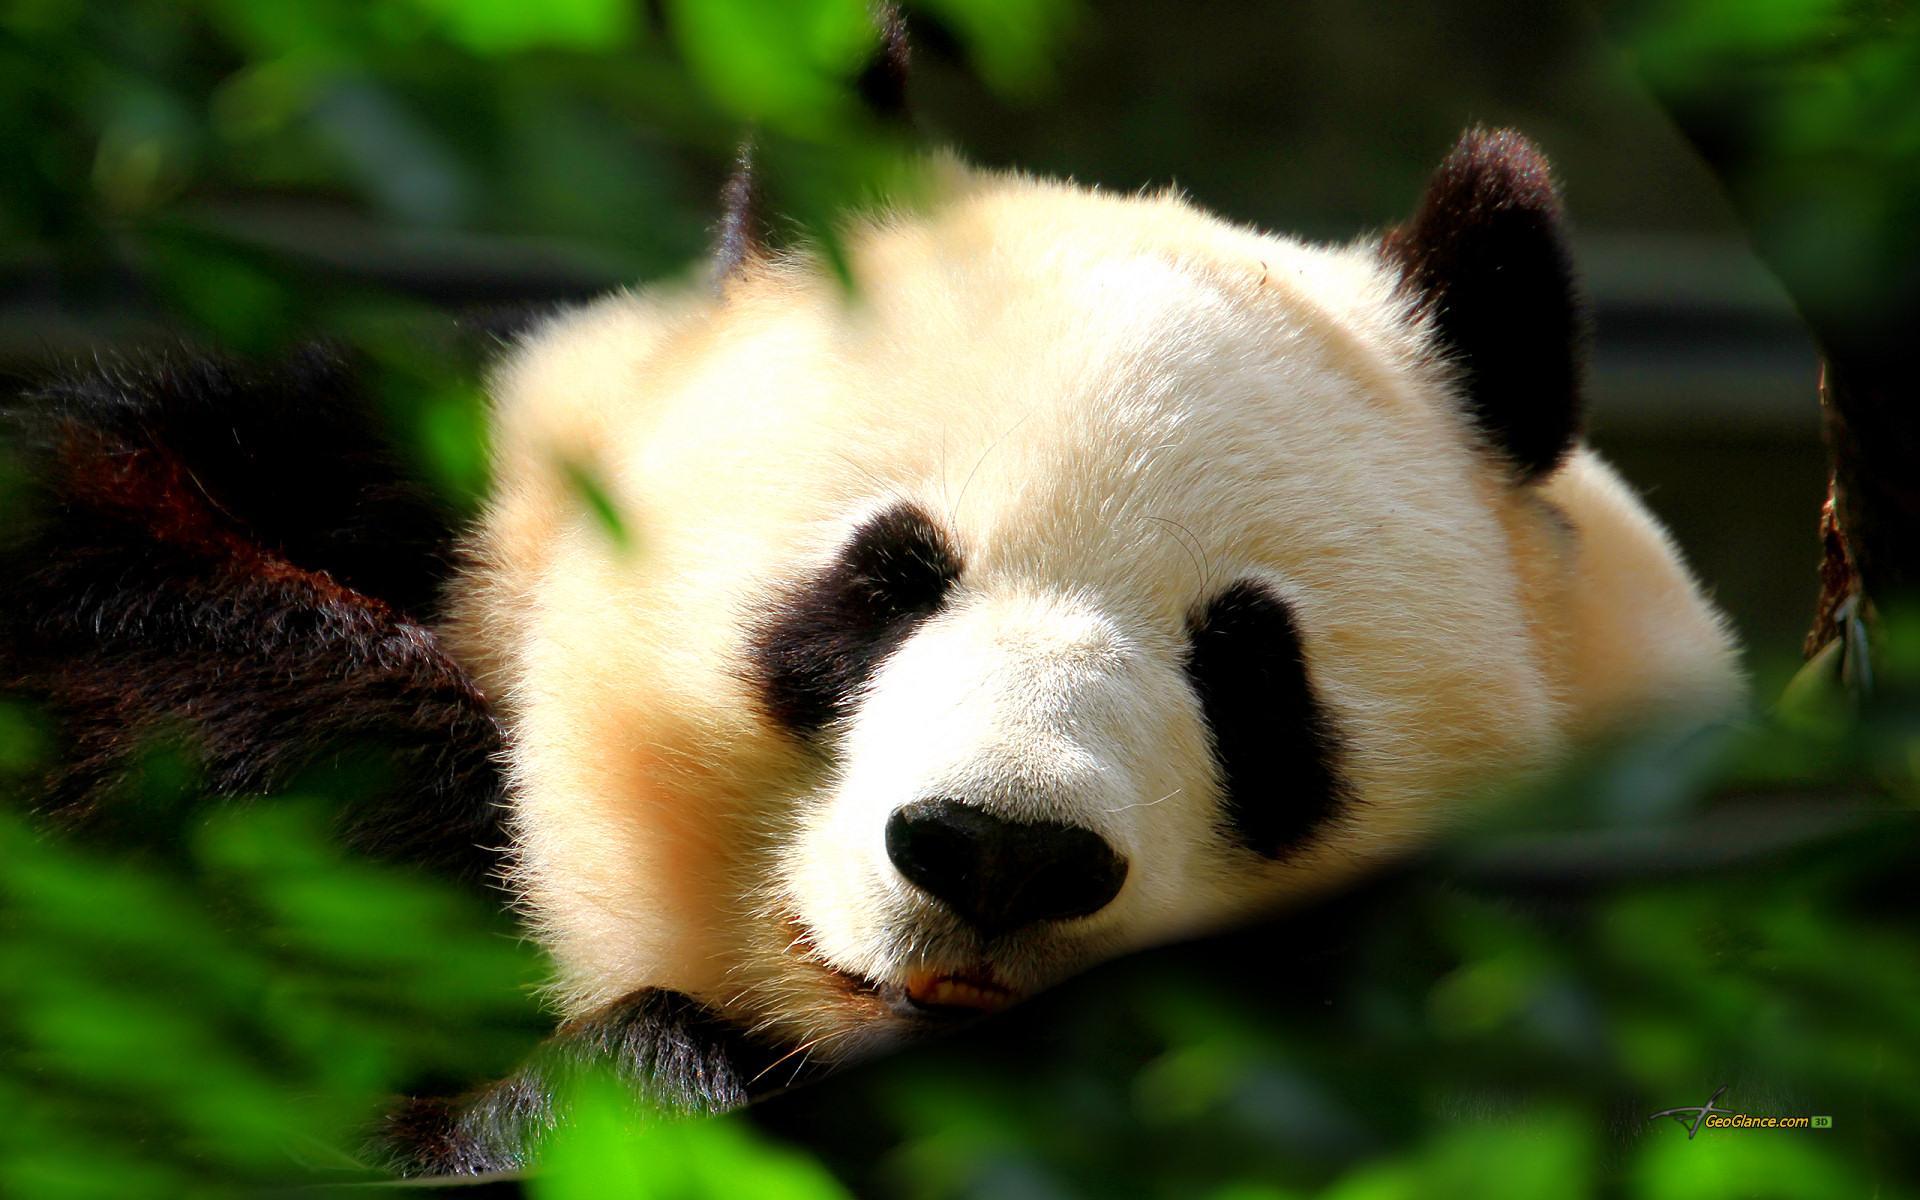 Superbe Ours Panda Geant Fond D Ecran Mignon Panda 1920x1200 Wallpapertip